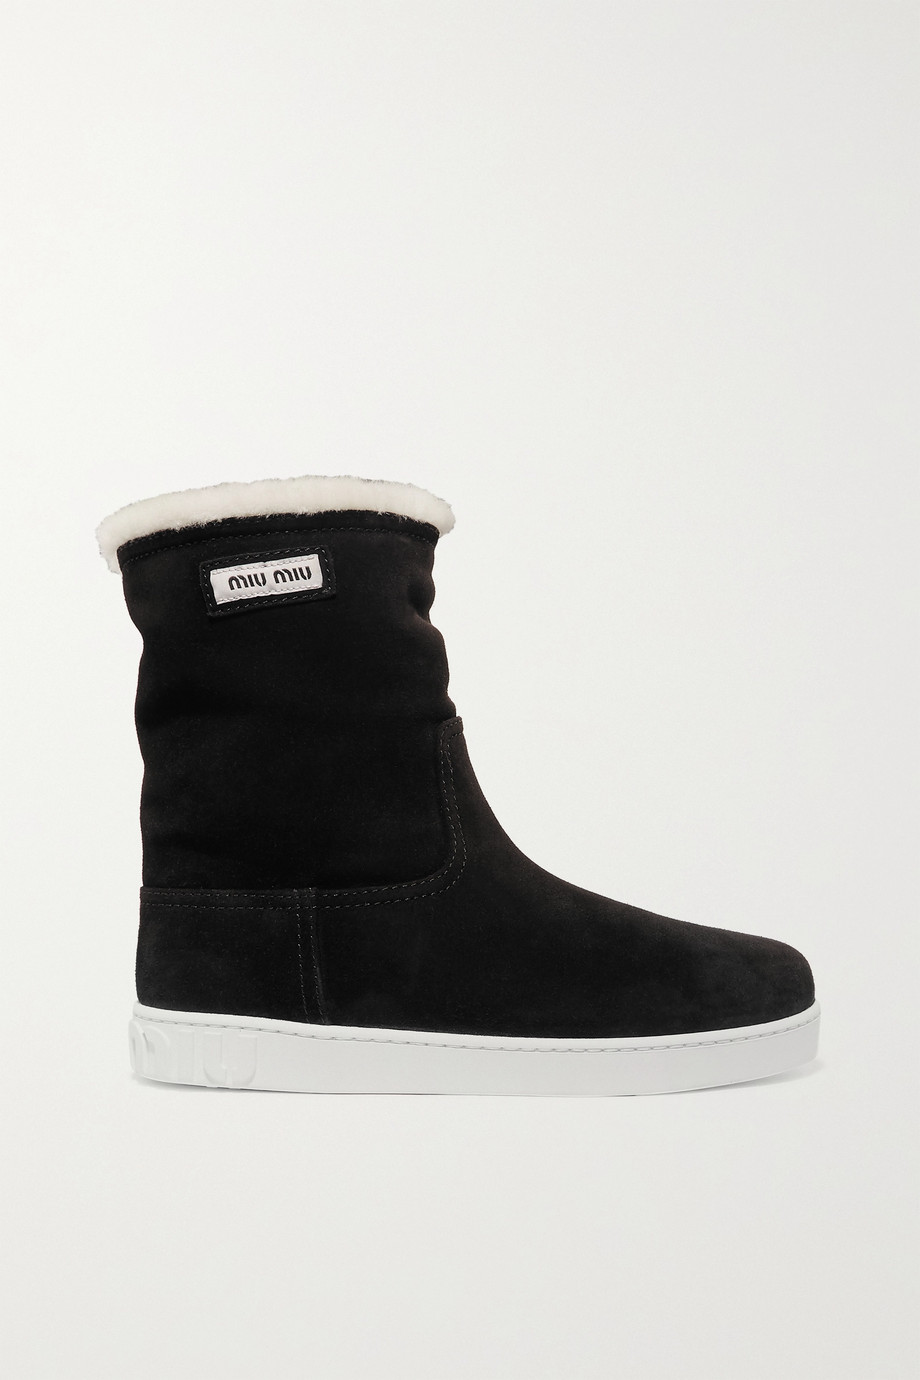 Miu Miu Shearling-lined logo-print suede boots